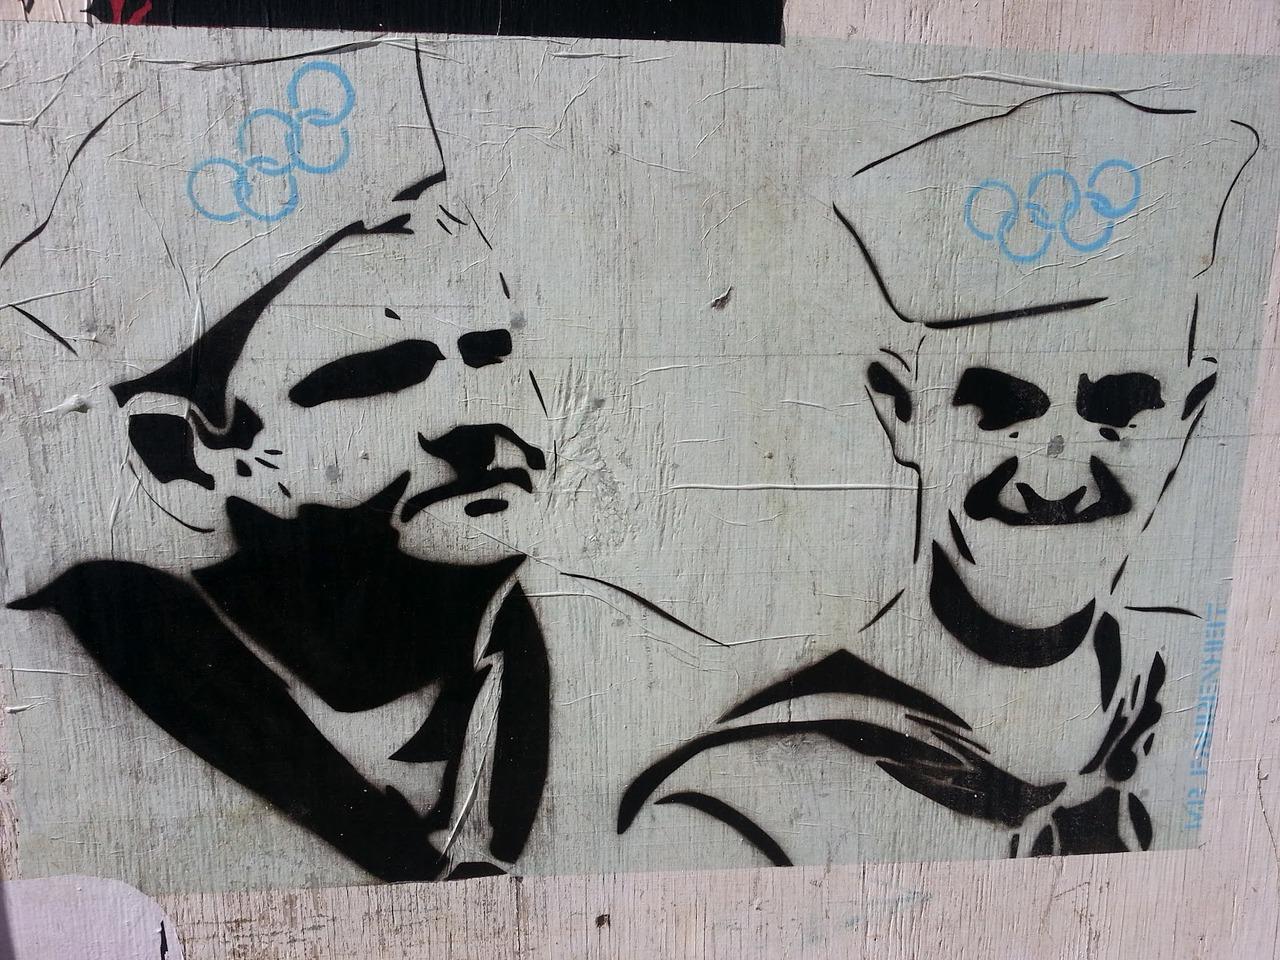 Graffiti Stencils - Amazing Nails  Graffiti Stenci...